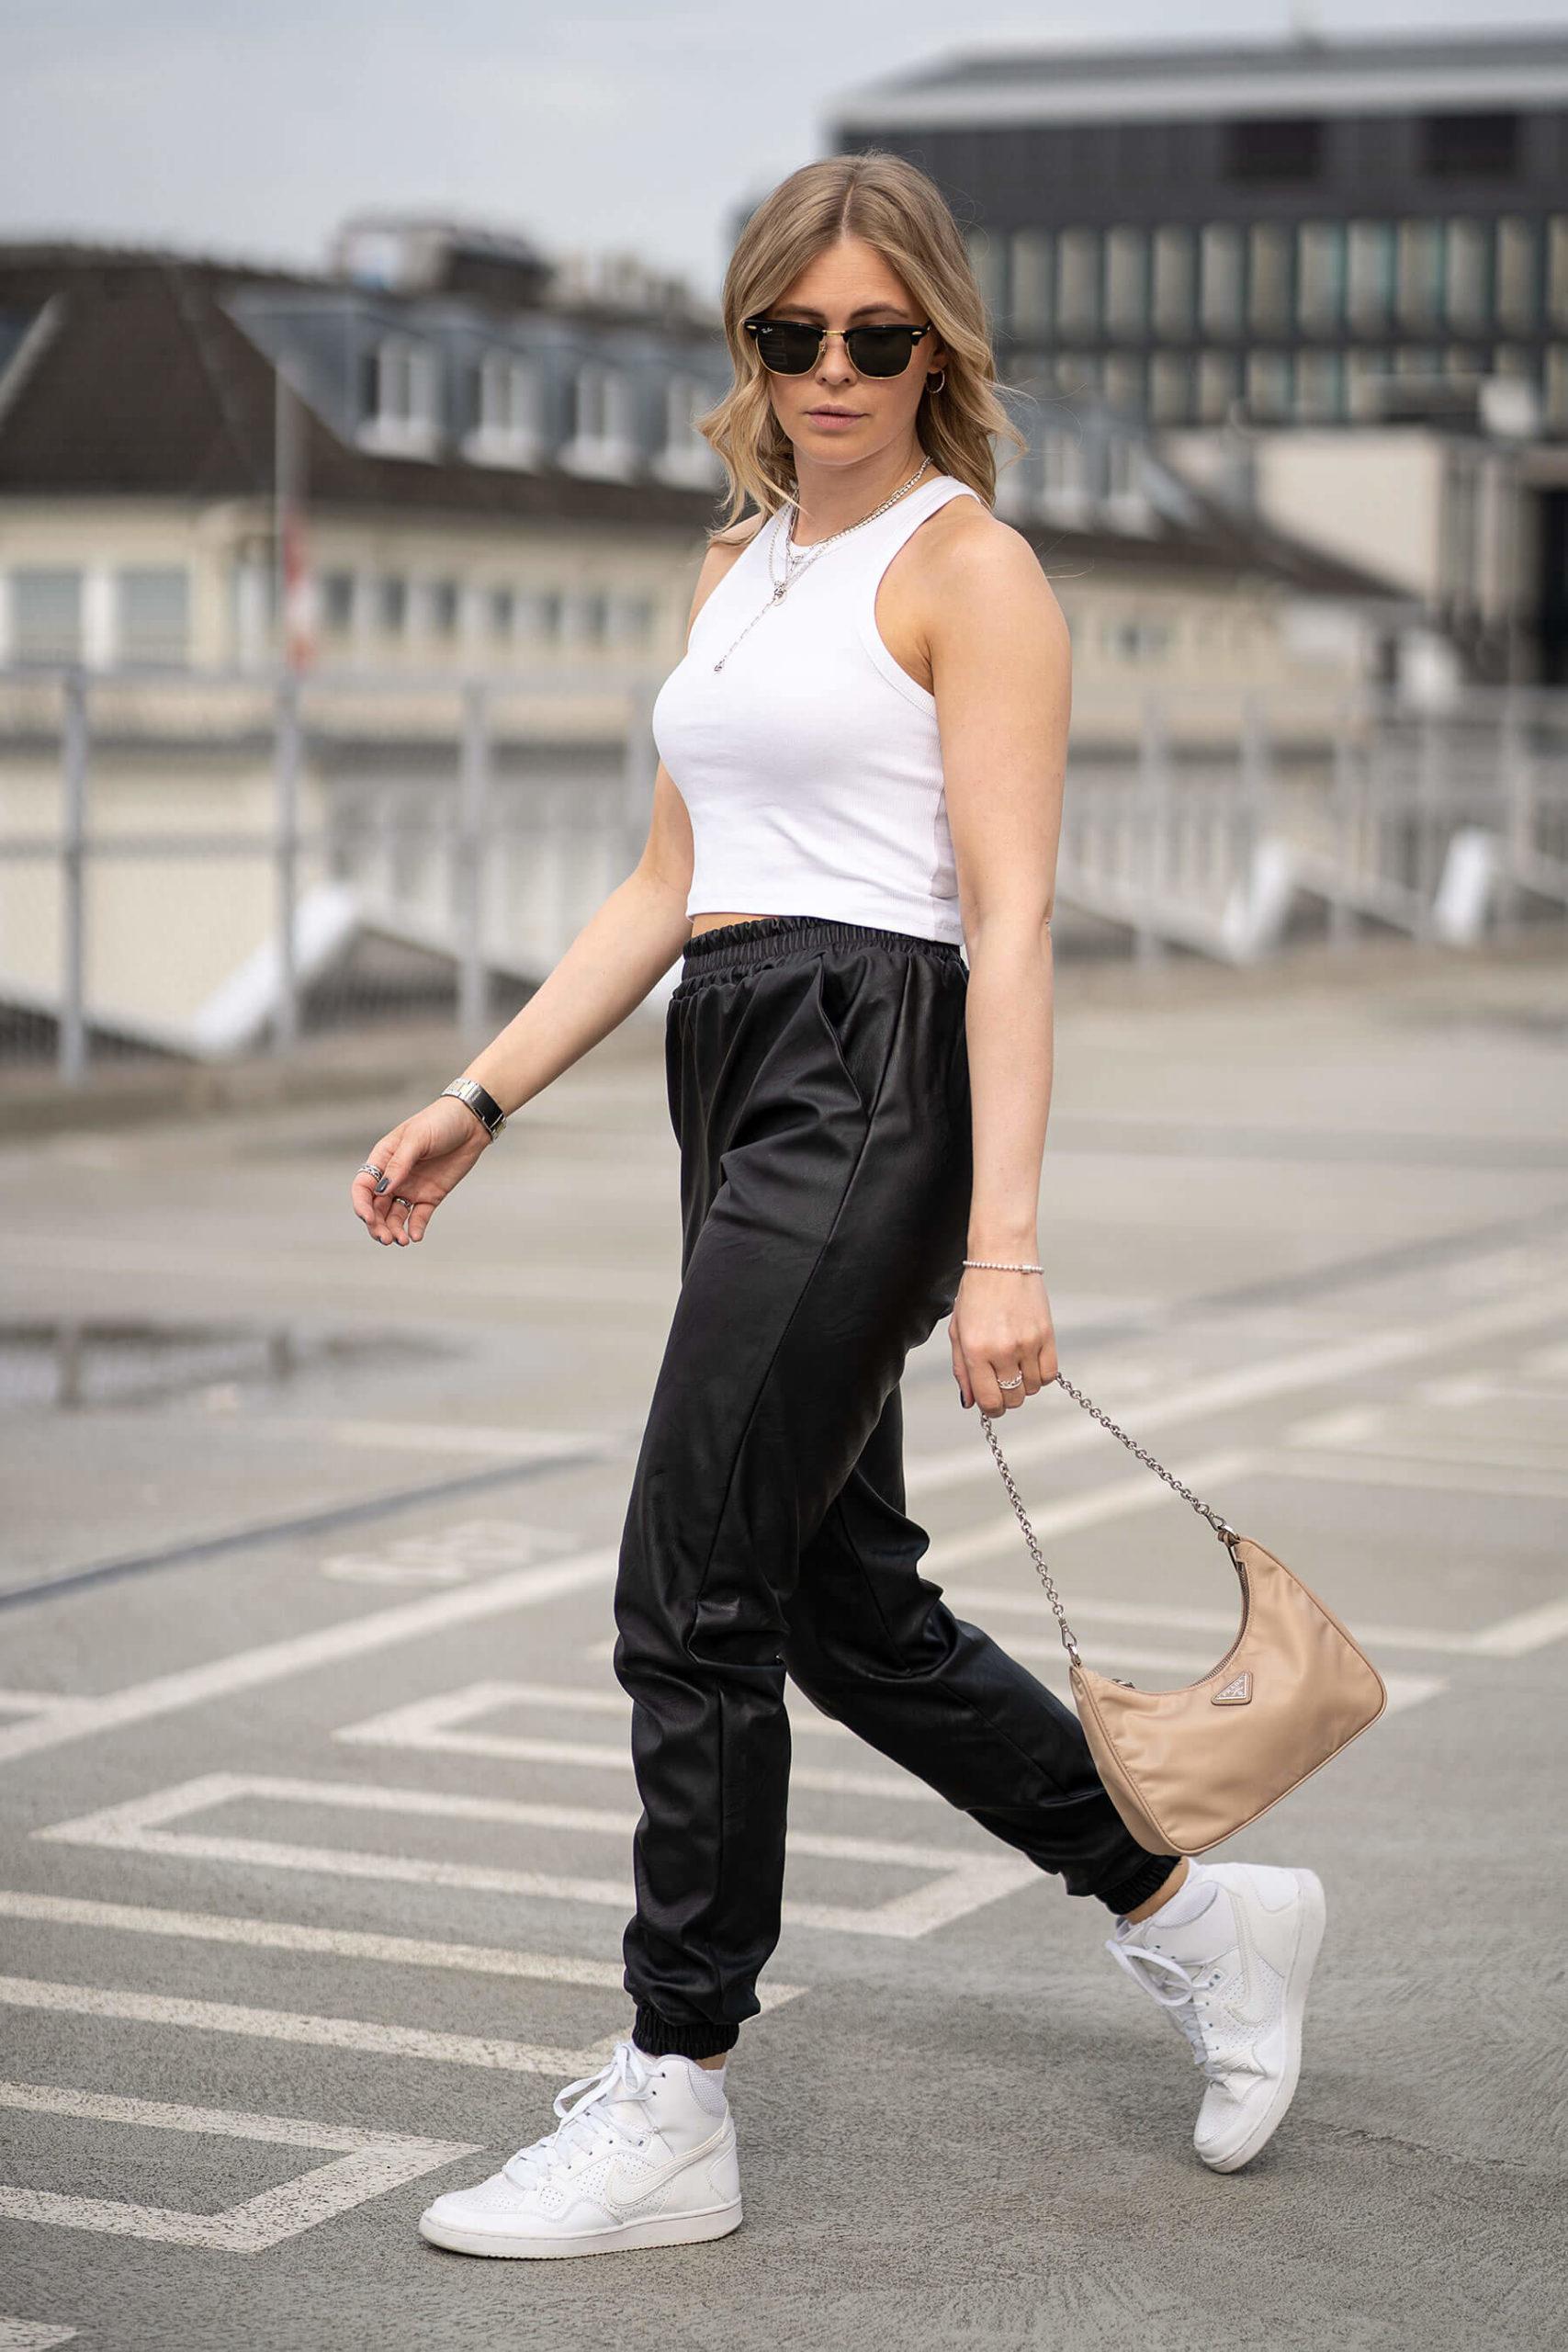 fashion blogger tank top outfit inga brauer düsseldorf